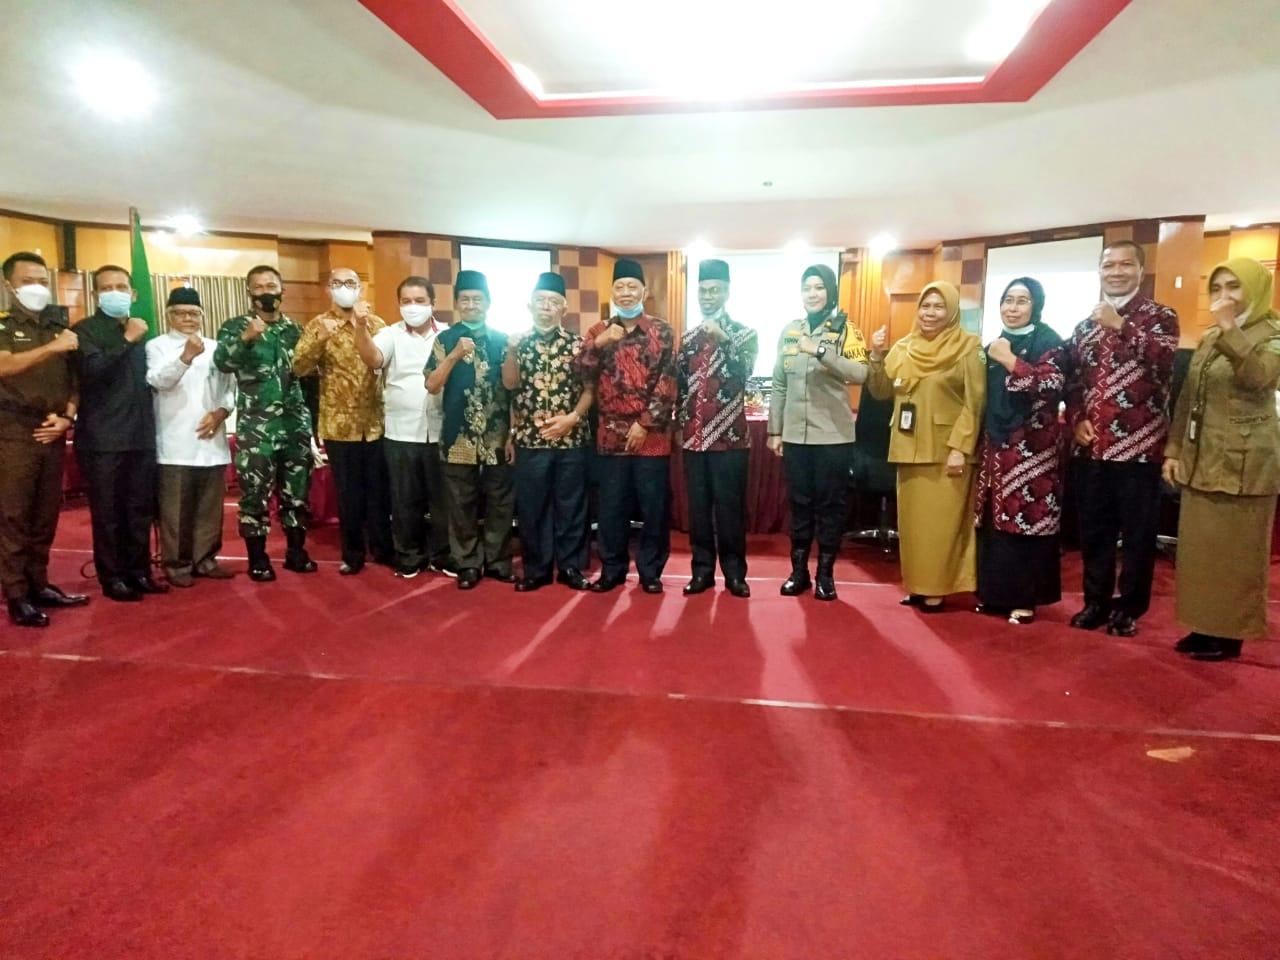 Rapat RPJMD di Banyuasin Sumsel (Dok. Humas Pemkab Banyuasin / Mattanews.co)